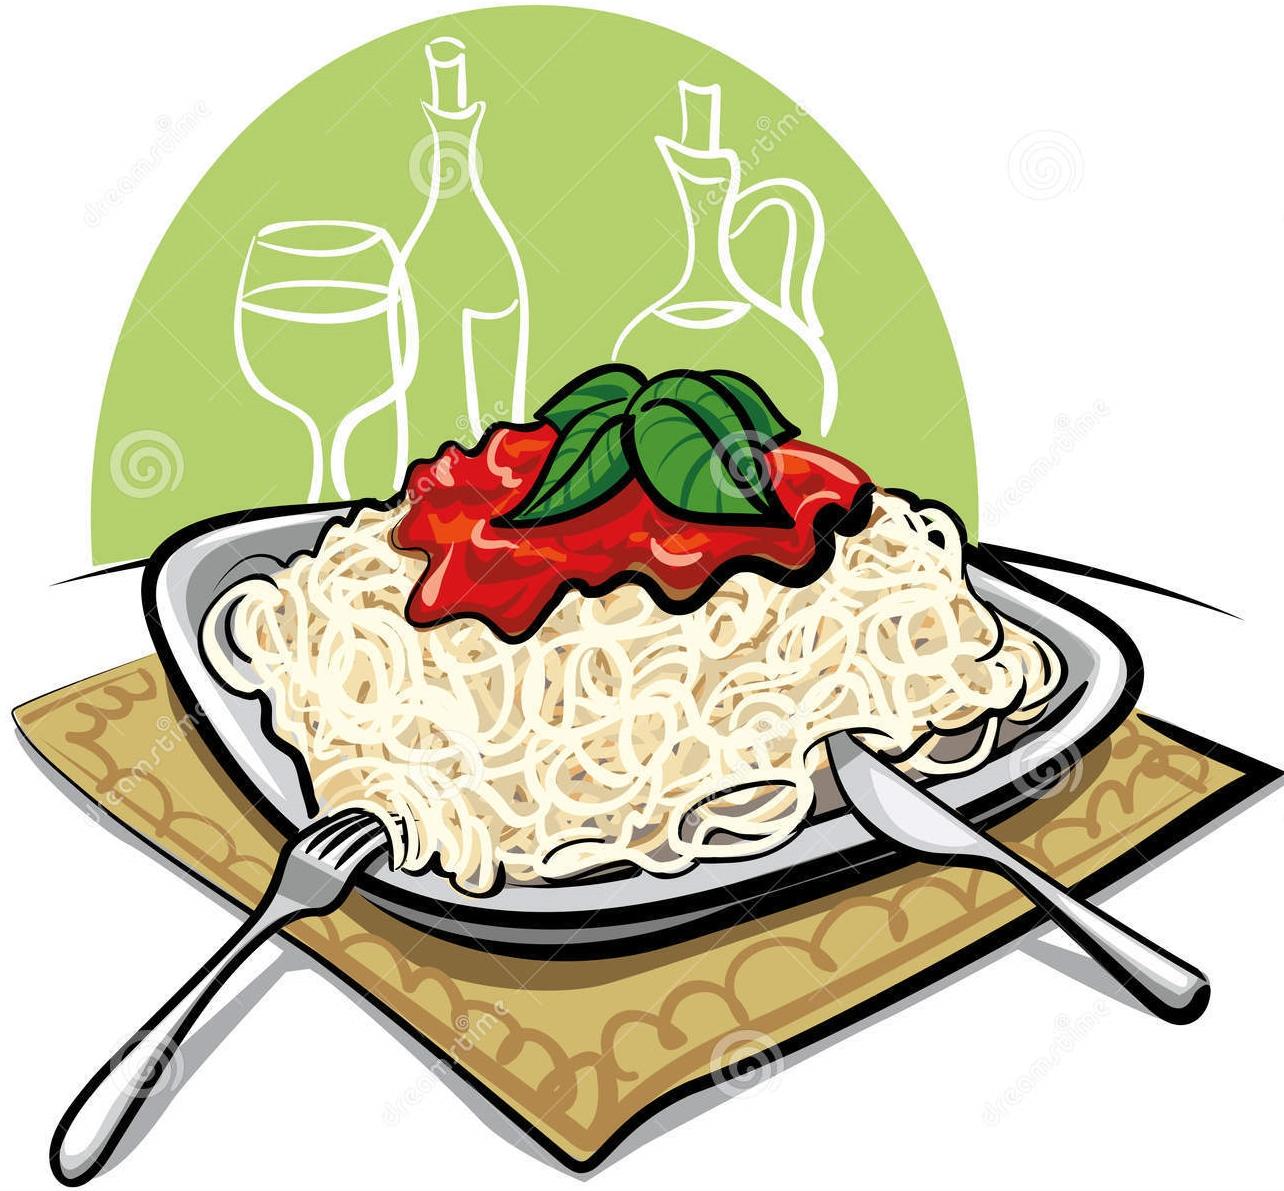 1284x1191 Spaghetti Dinner Fundraiser Clipart